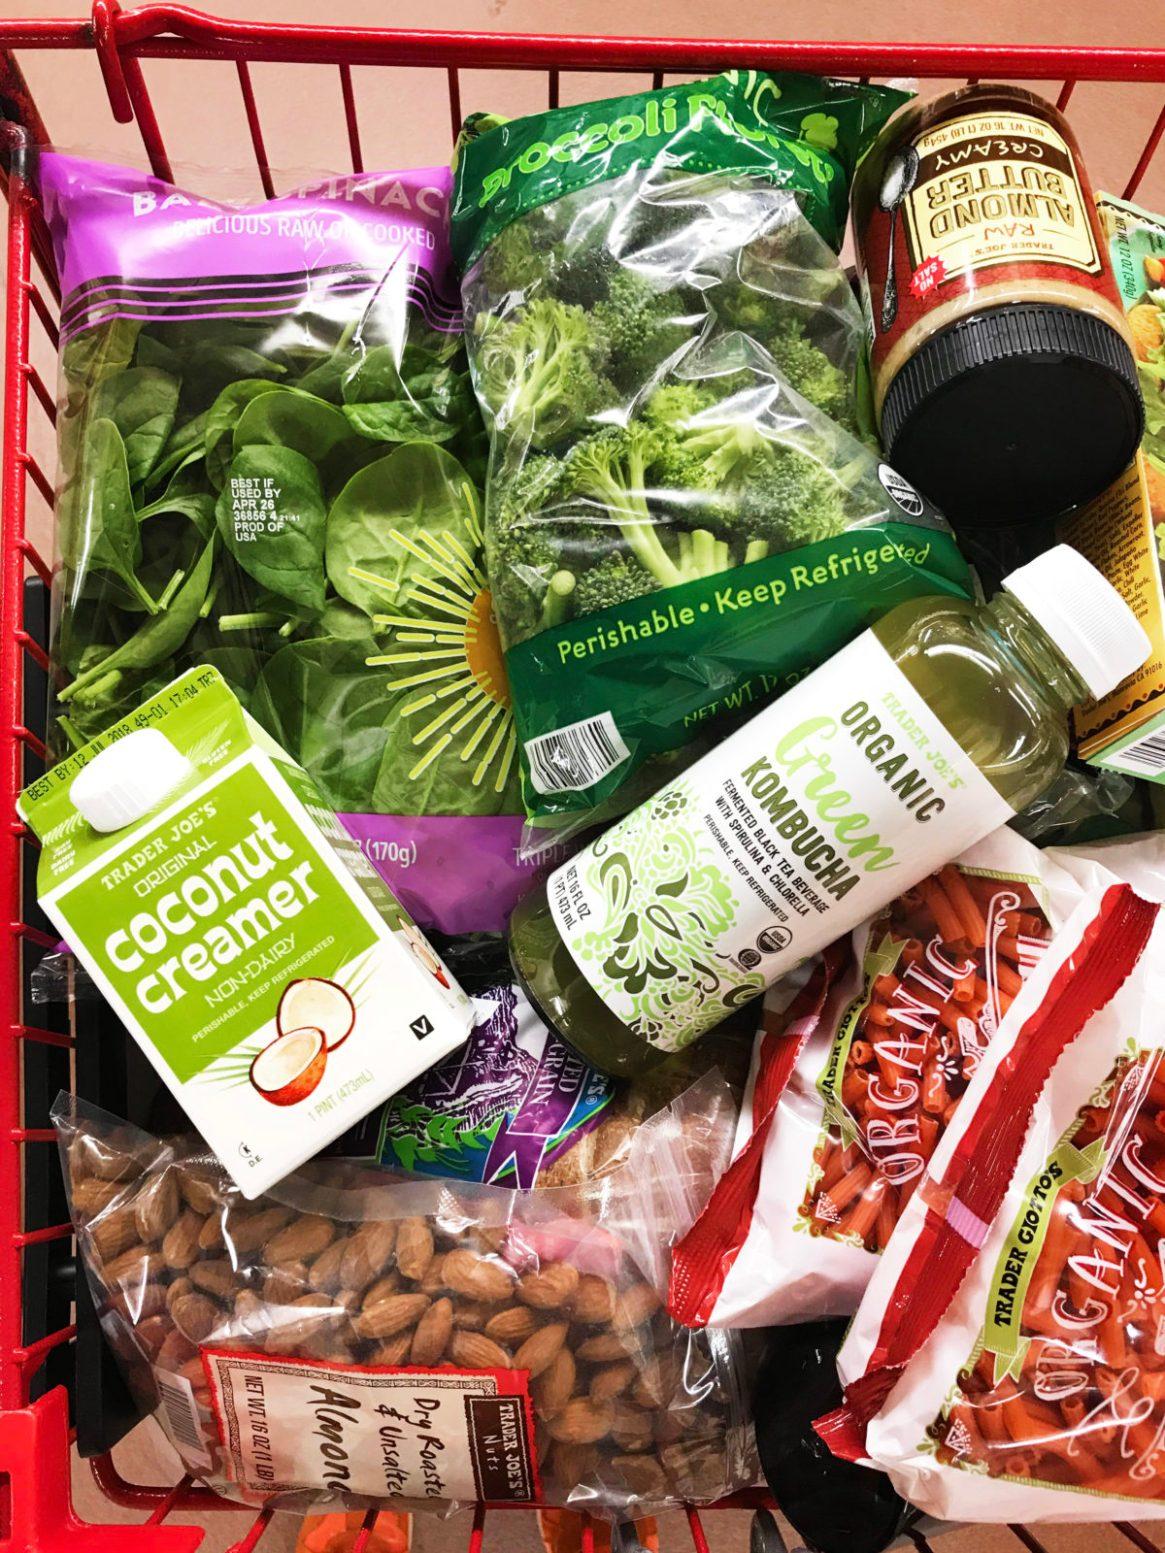 trader joes organic green kombucha trader joes coconut creamer